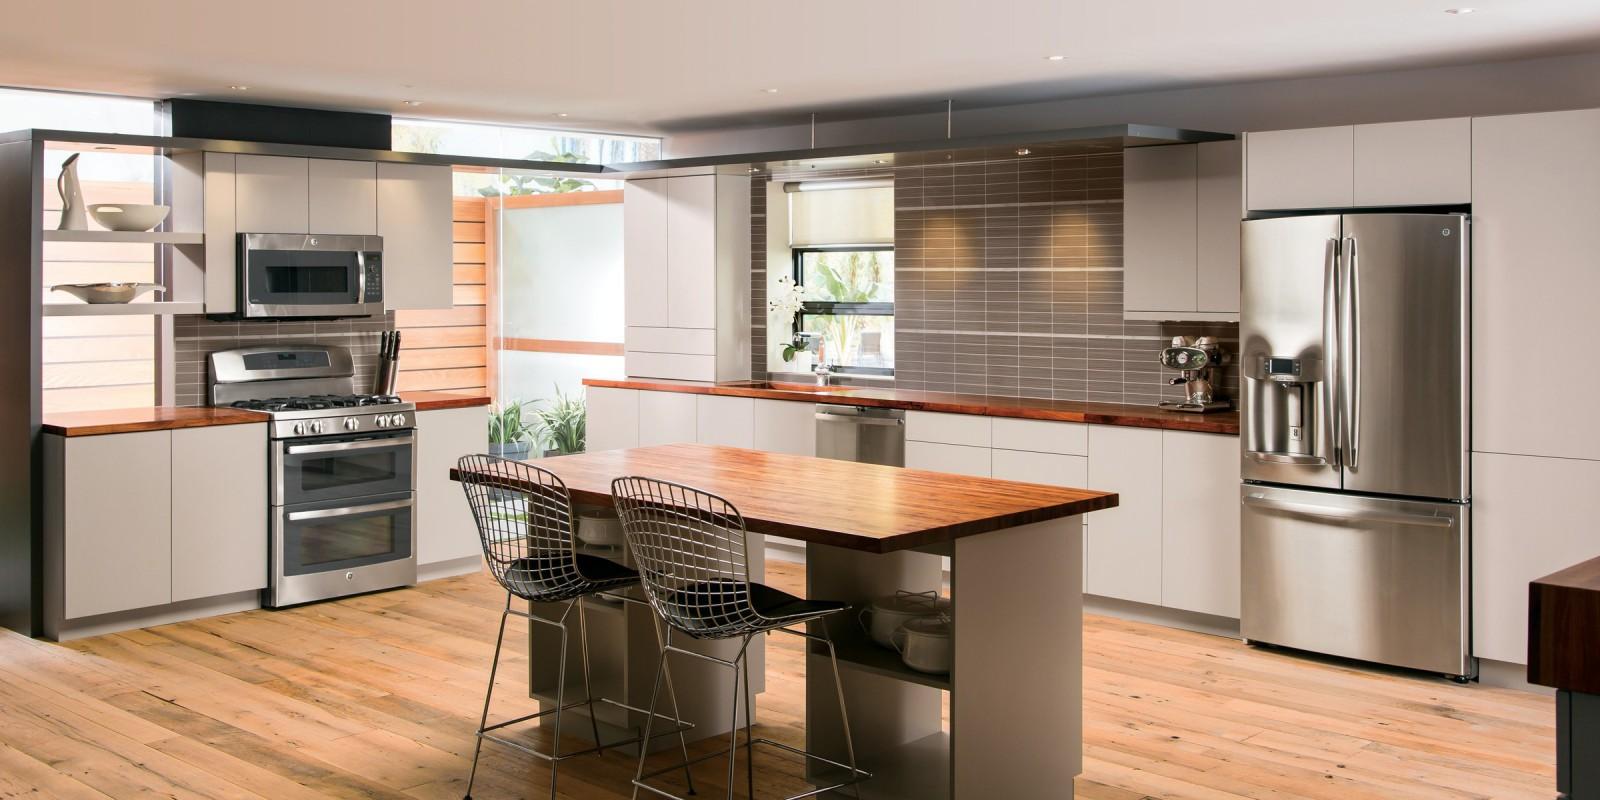 GE® Built-In Dishwasher | GDT225SSLSS | Discount Cabinets ...